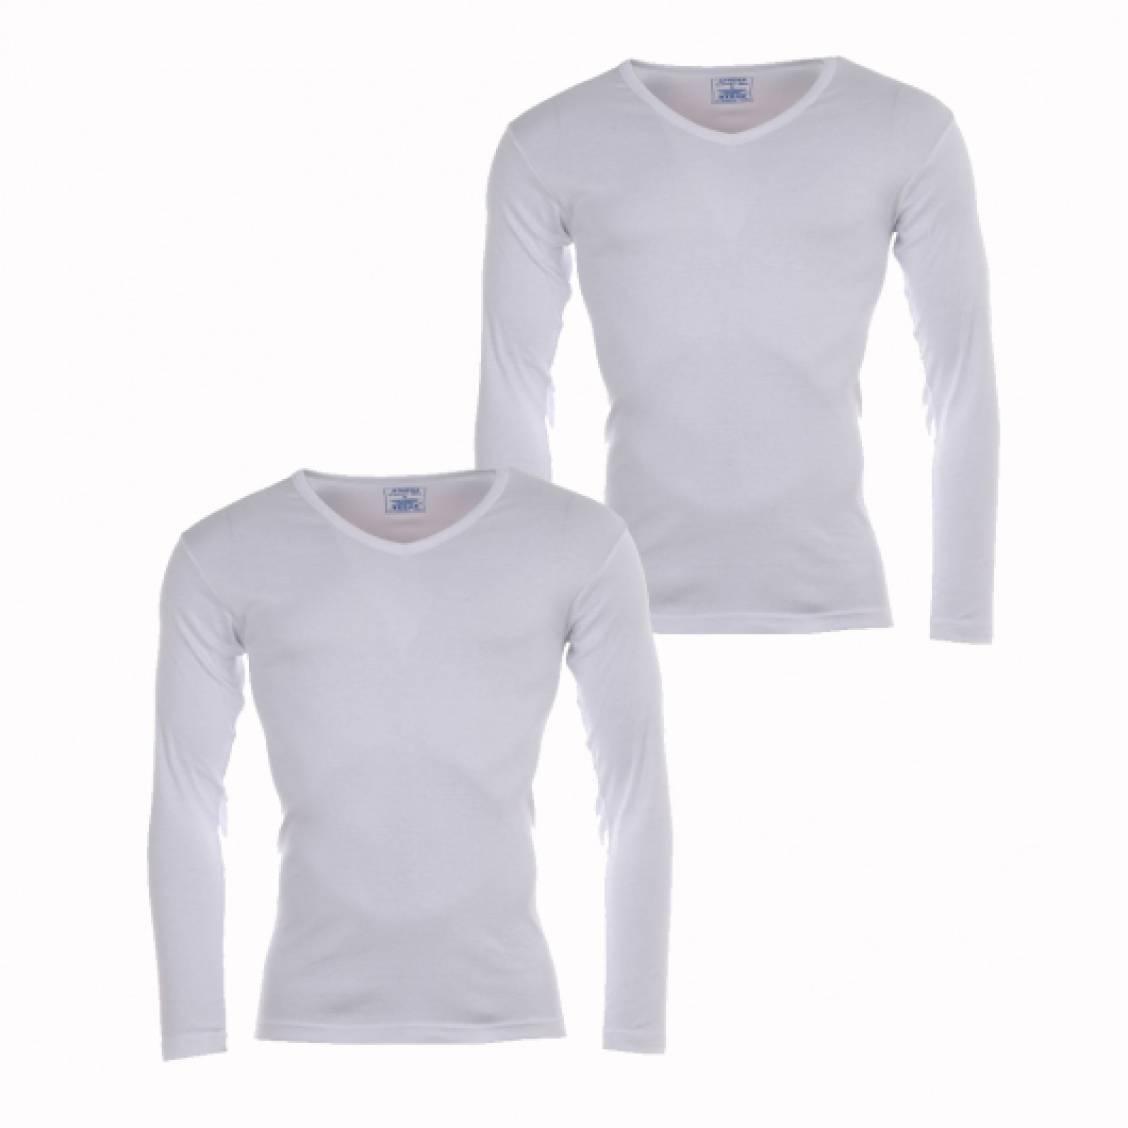 lot de 2 tee shirts manches longues col v blanc coton bio. Black Bedroom Furniture Sets. Home Design Ideas